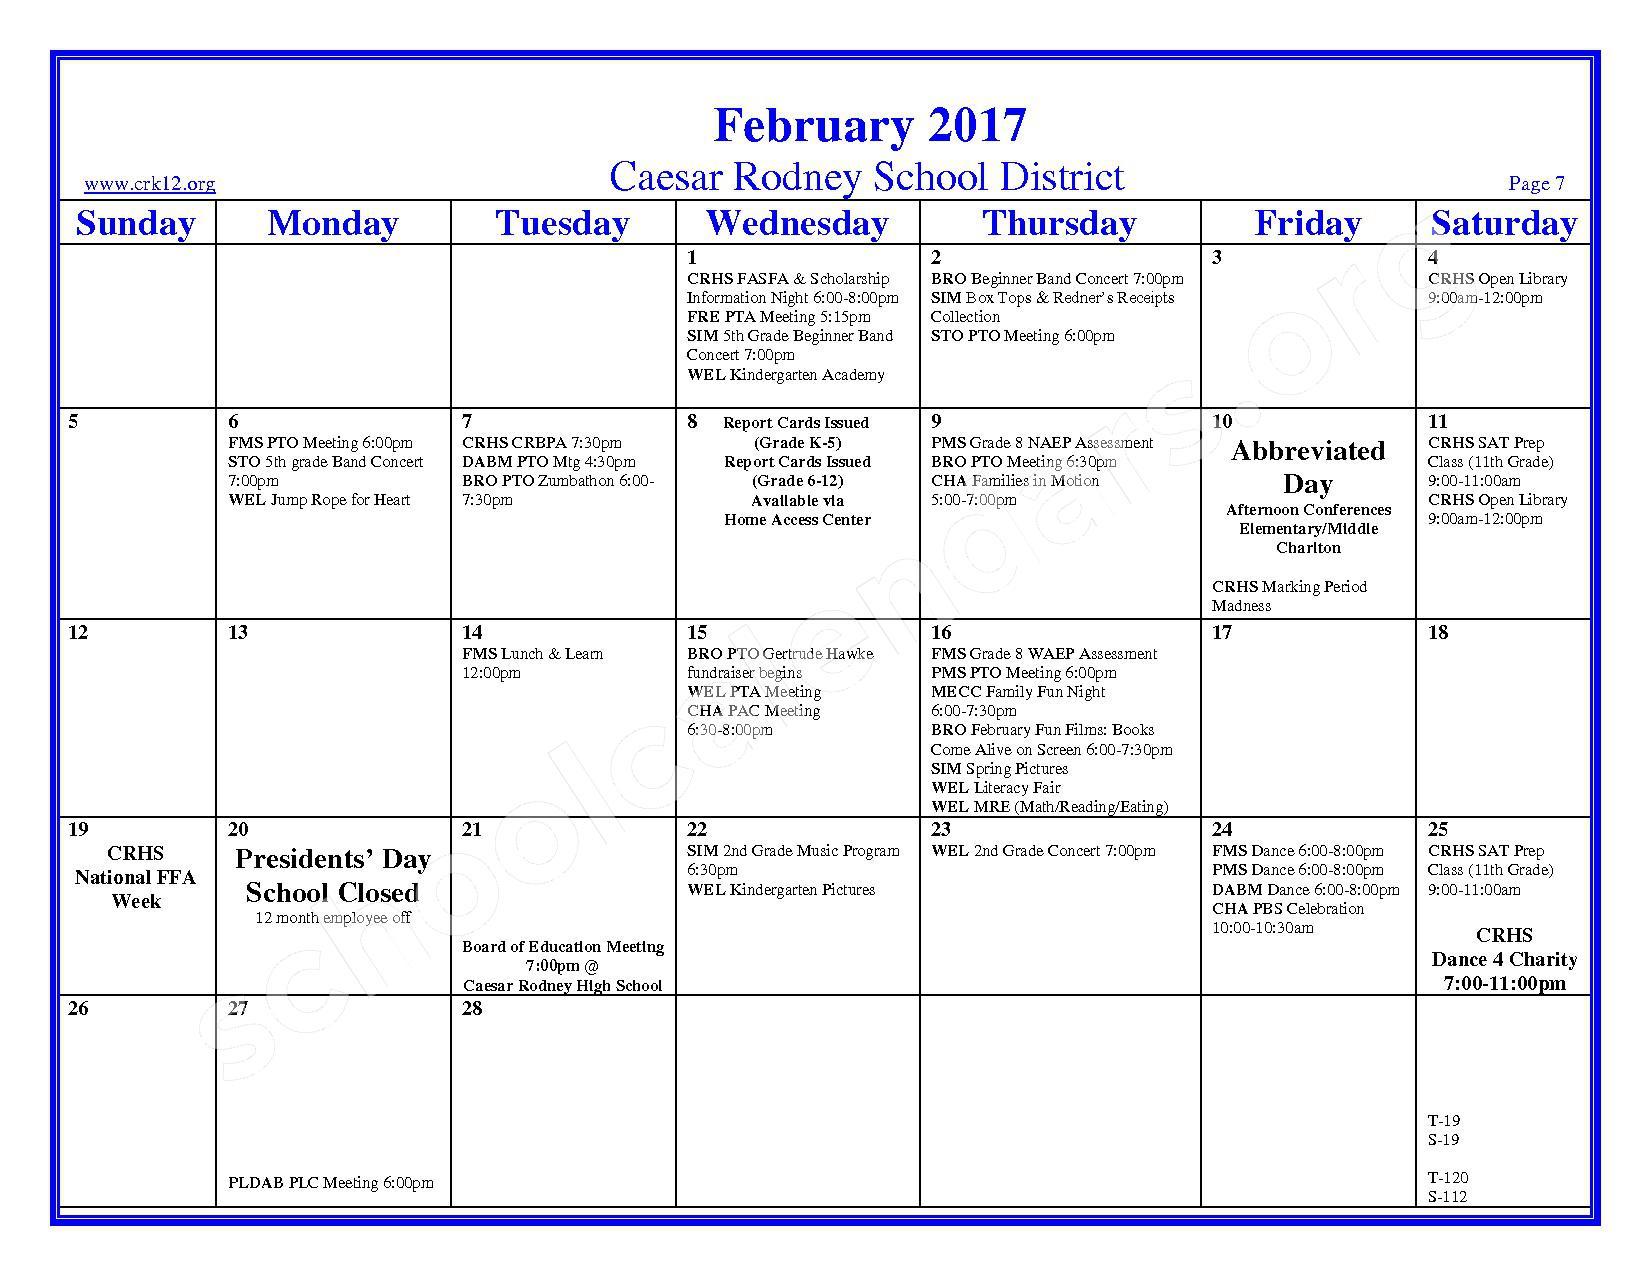 2016 - 2017 School Calendar – Brown (W. Reily) Elementary School – page 7